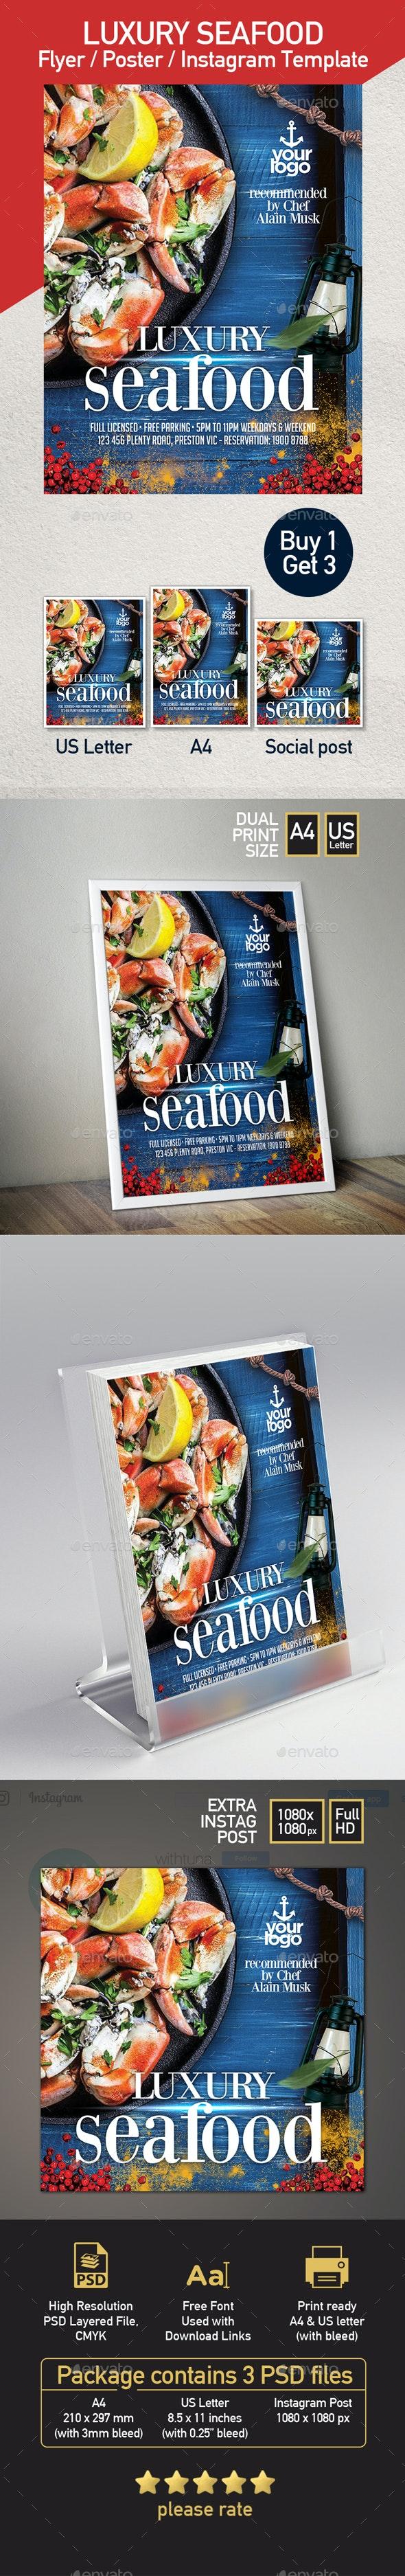 Seafood Restaurant - Set of 3 Flyer Templates - Restaurant Flyers